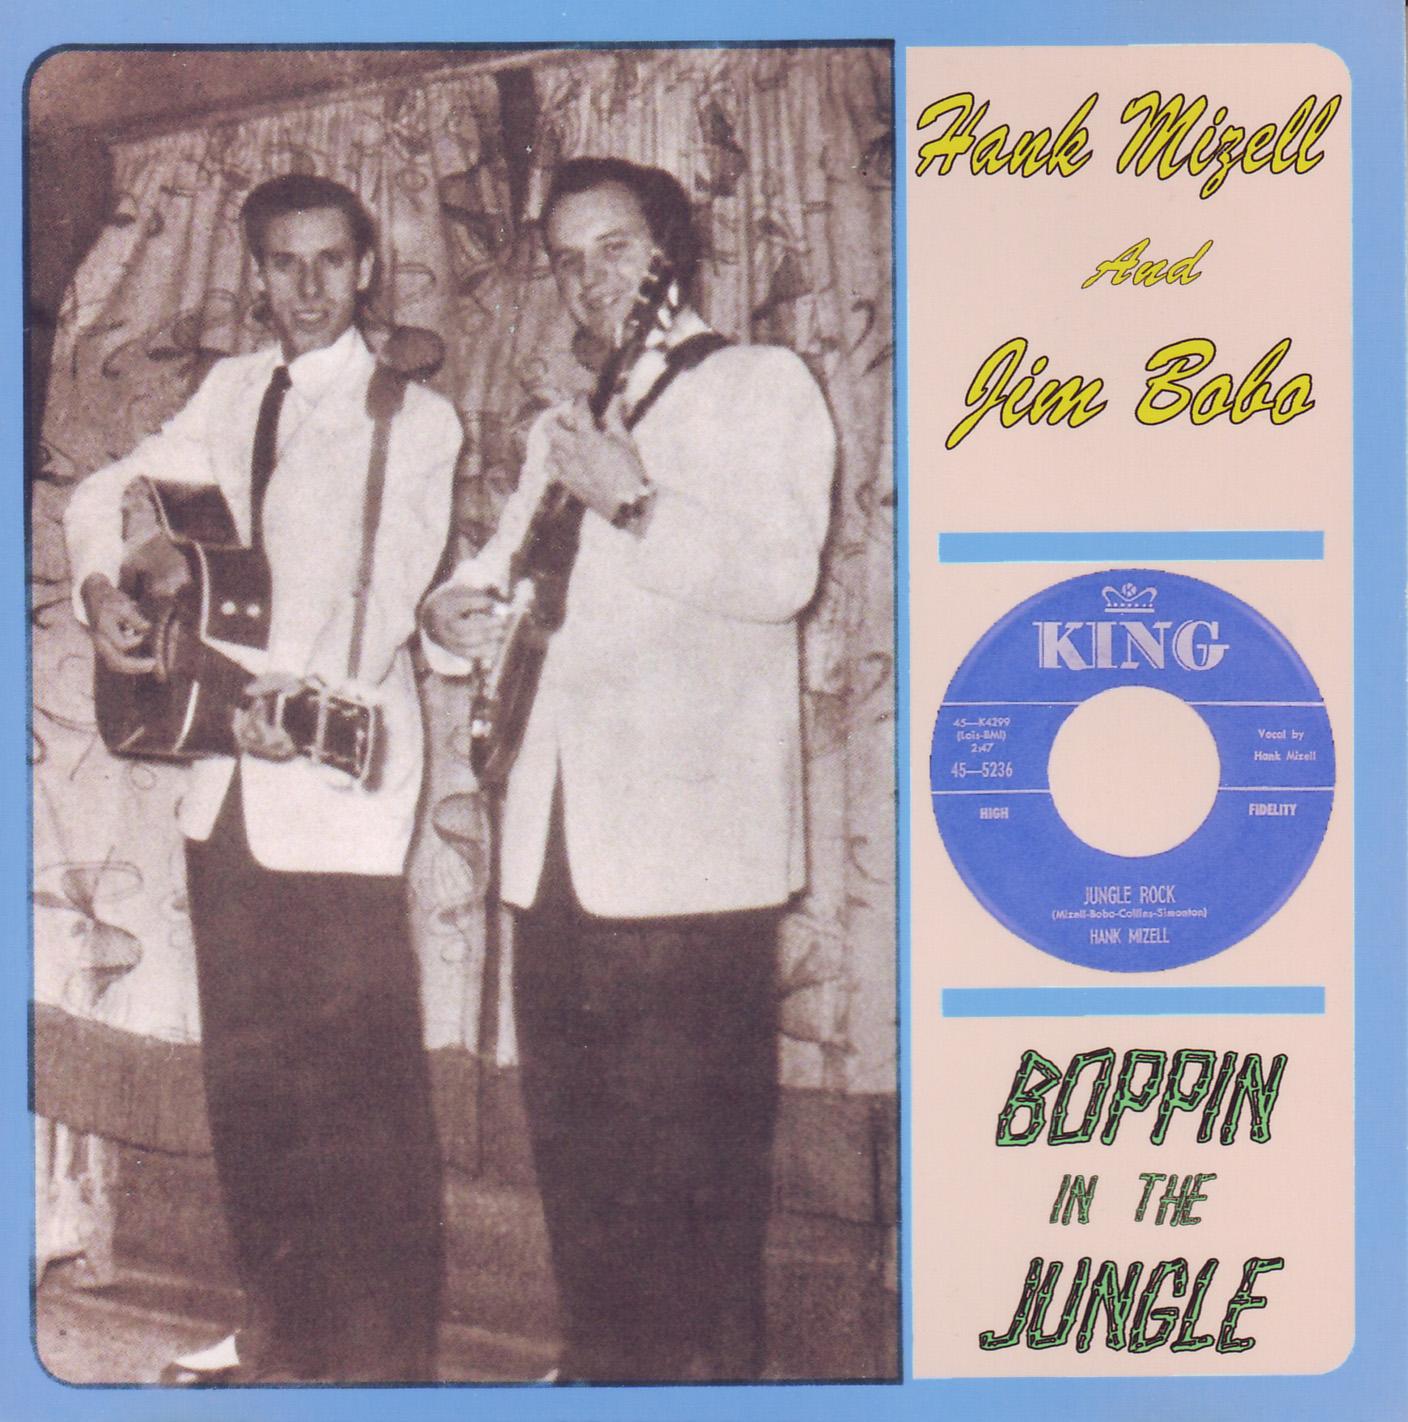 HANK MIZELL & JIM BOBO